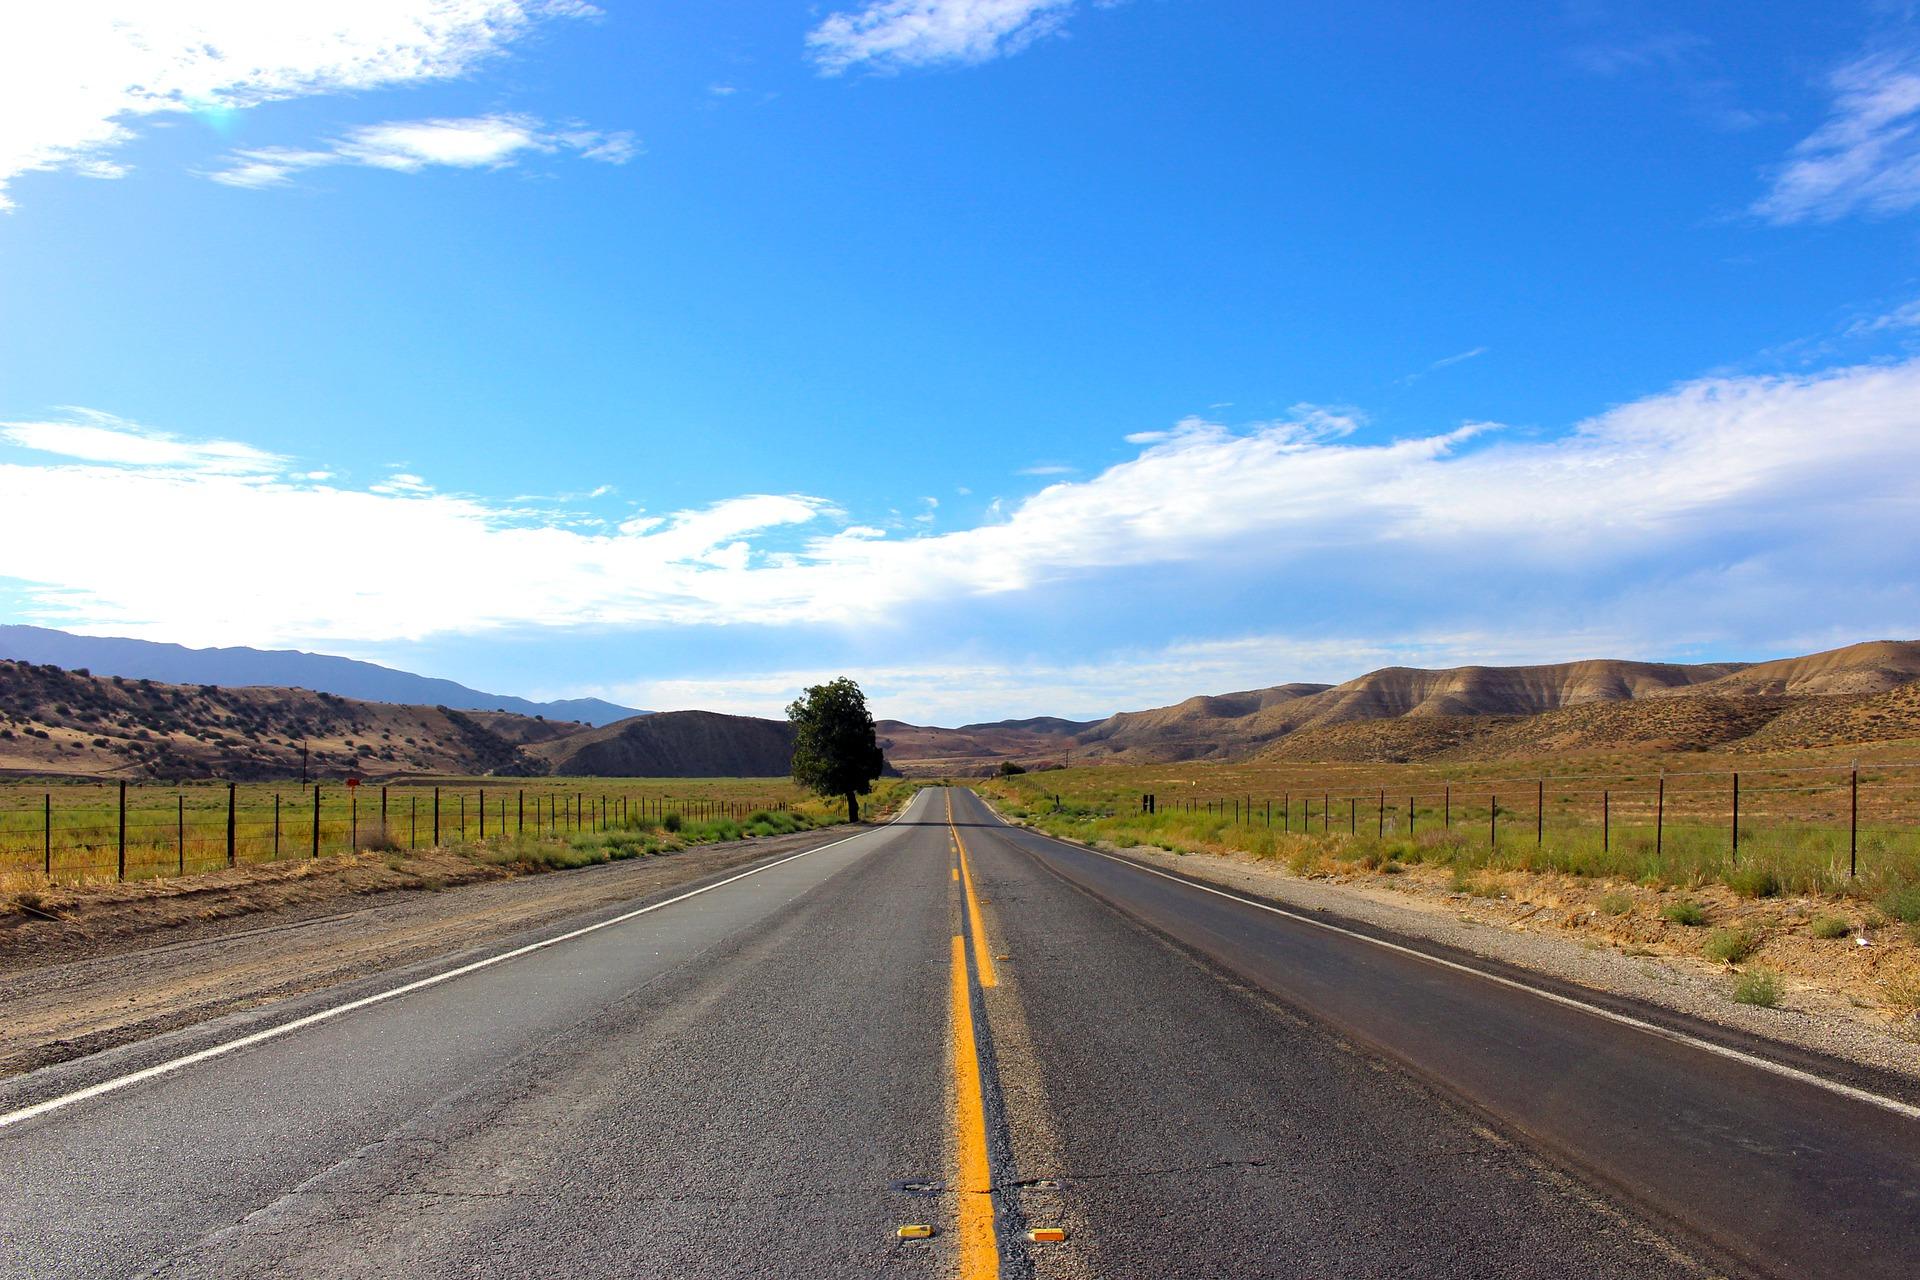 road-2159661_1920